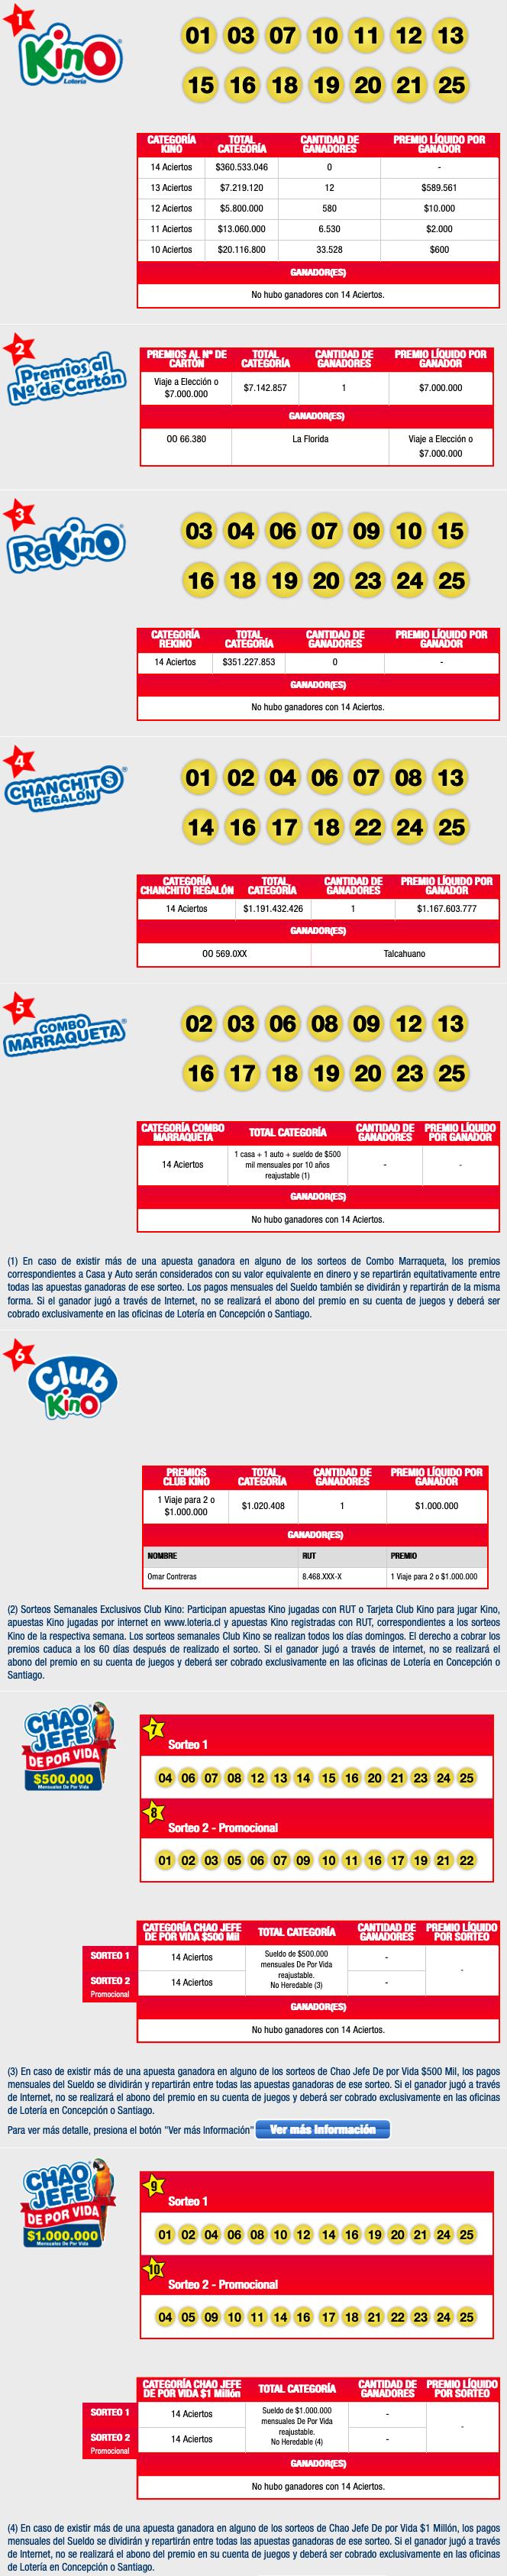 Kino Sorteo 2217